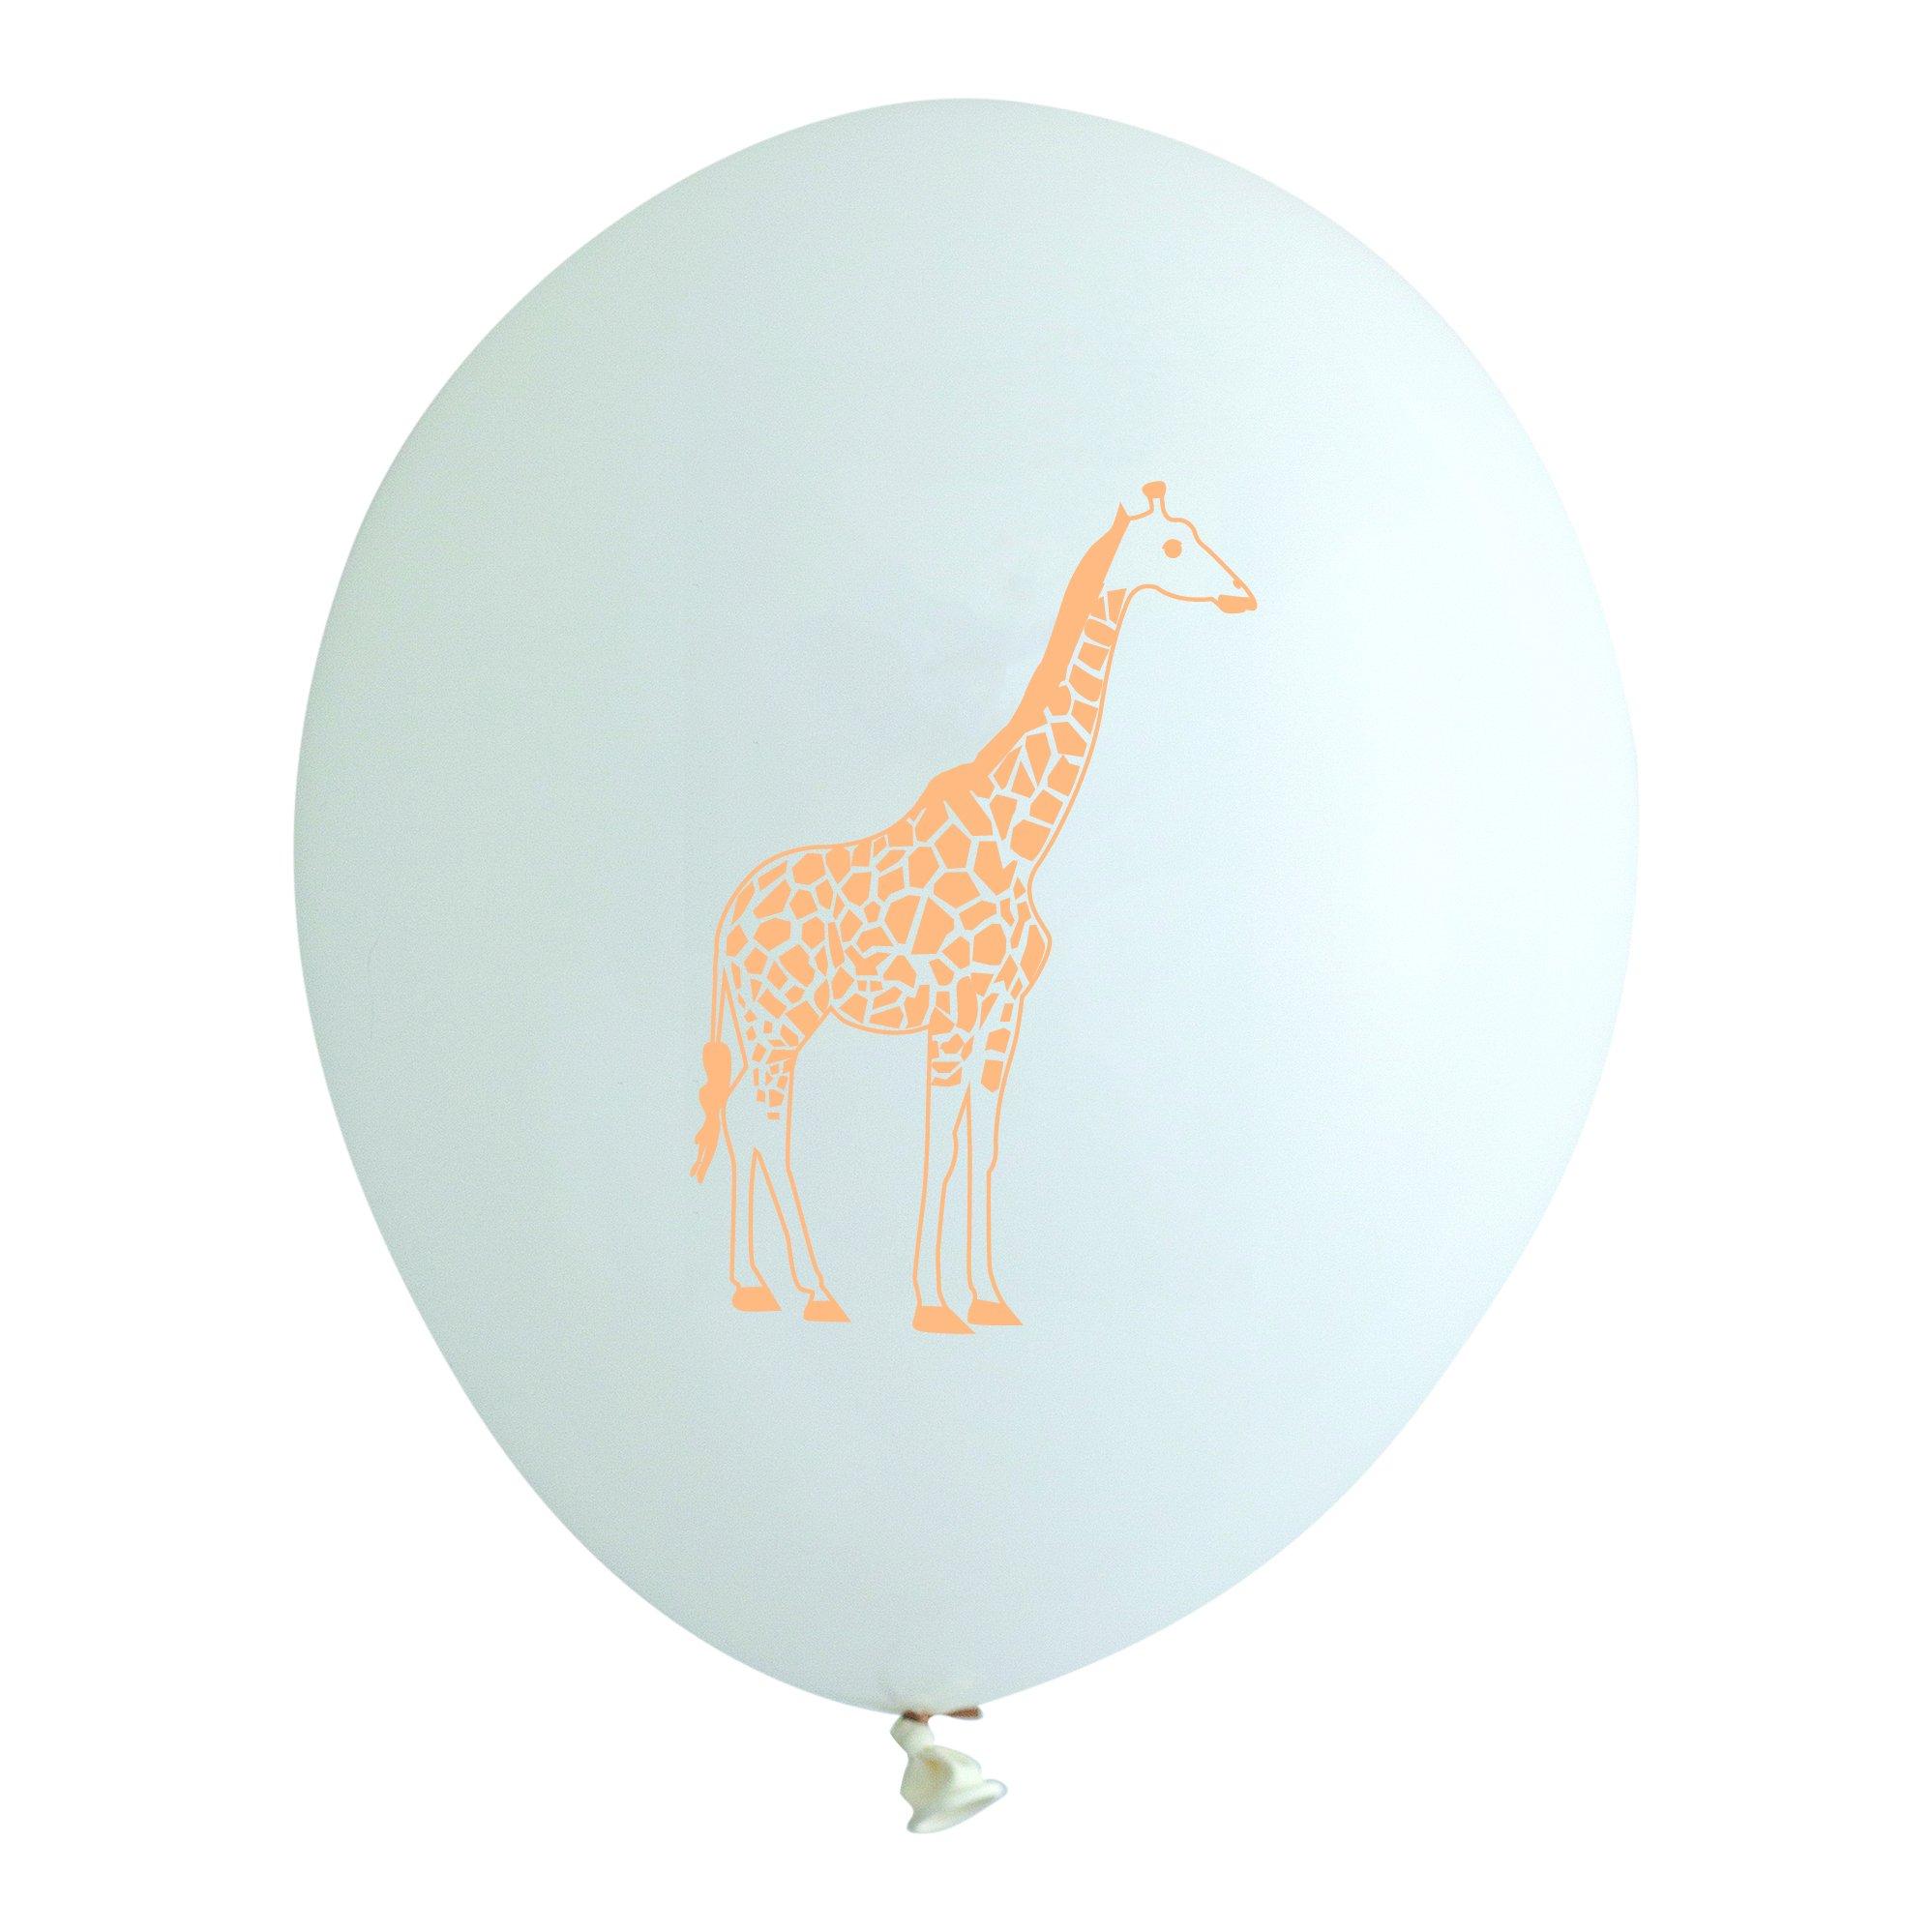 Giraffe Safari Latex Party Balloons, made in America by REVEL & Co